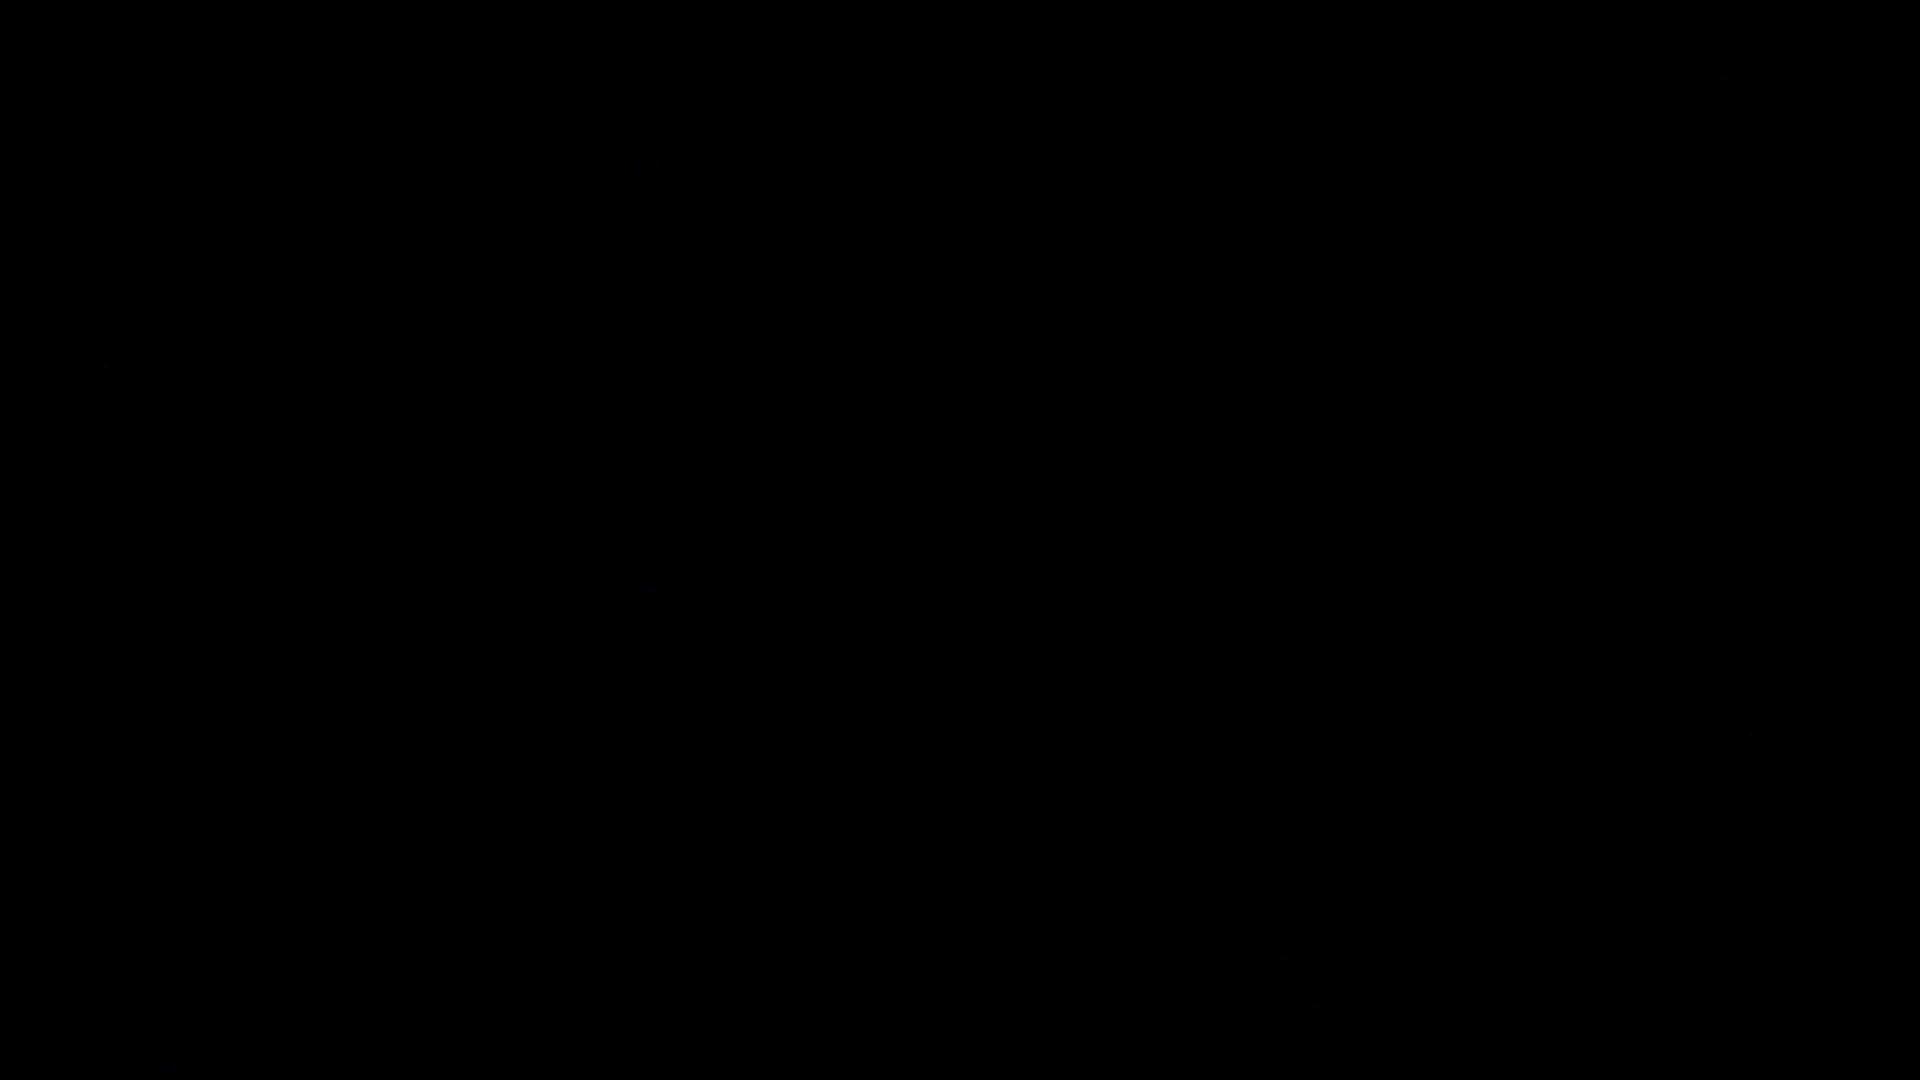 SPYさん初投稿!マンション覗き!5000K!ハイビジョン撮影VOL.04(現役ラグビー部大学生編) 自慰シーン ゲイフリーエロ画像 74枚 33